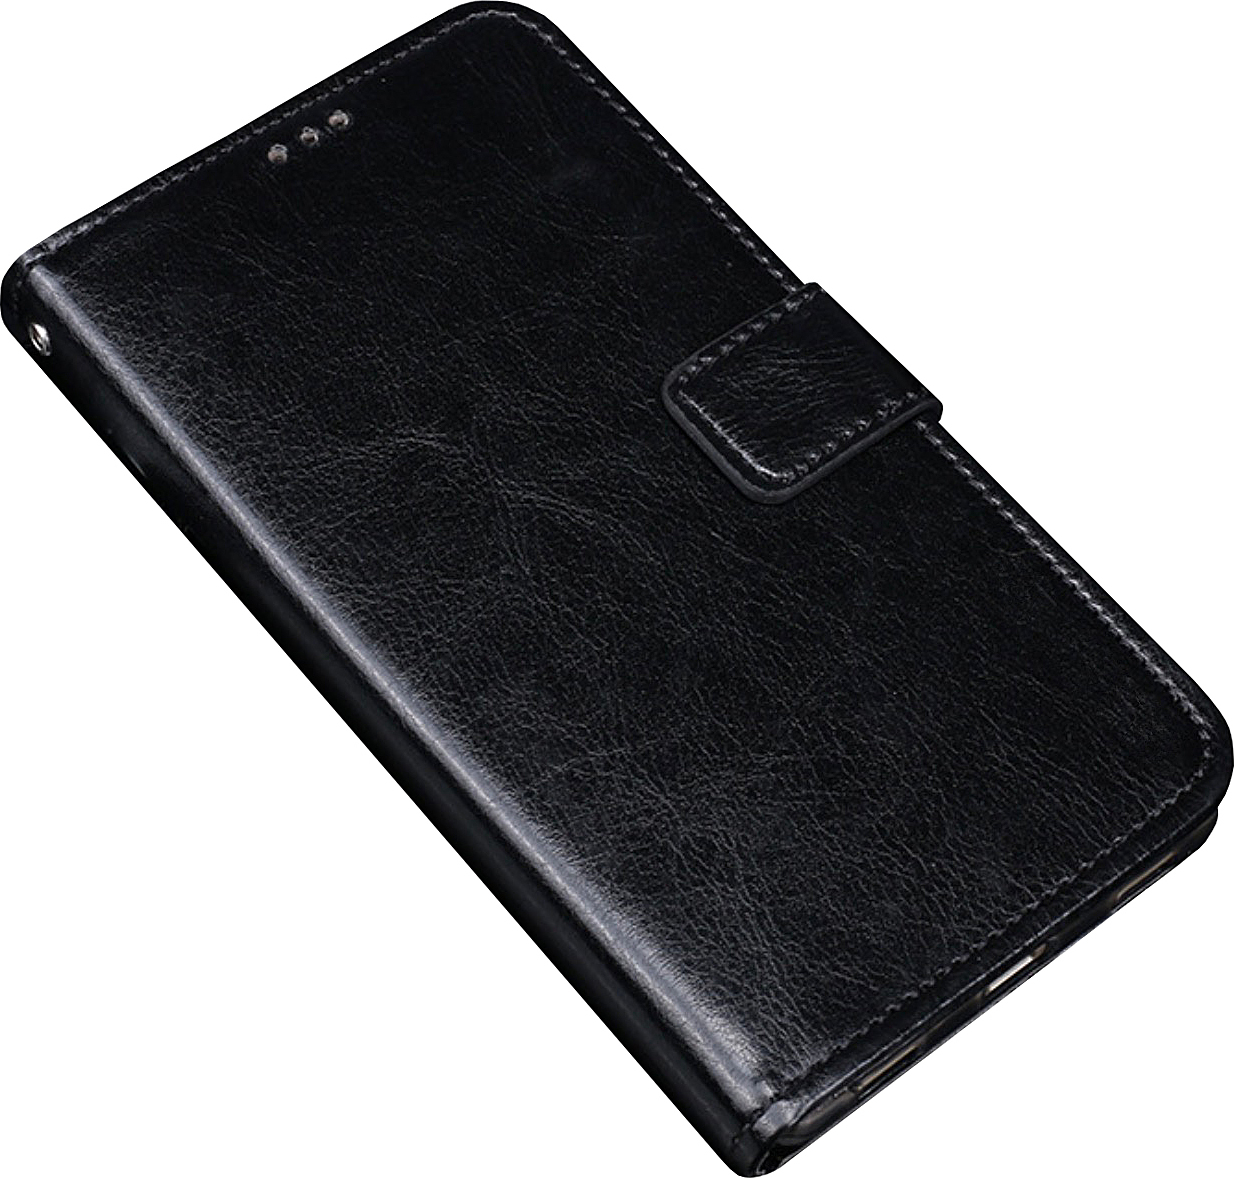 Чехол-книжка MyPads для Lenovo Phab PB1-750M/ 750N с мульти-подставкой застёжкой и визитницей черный